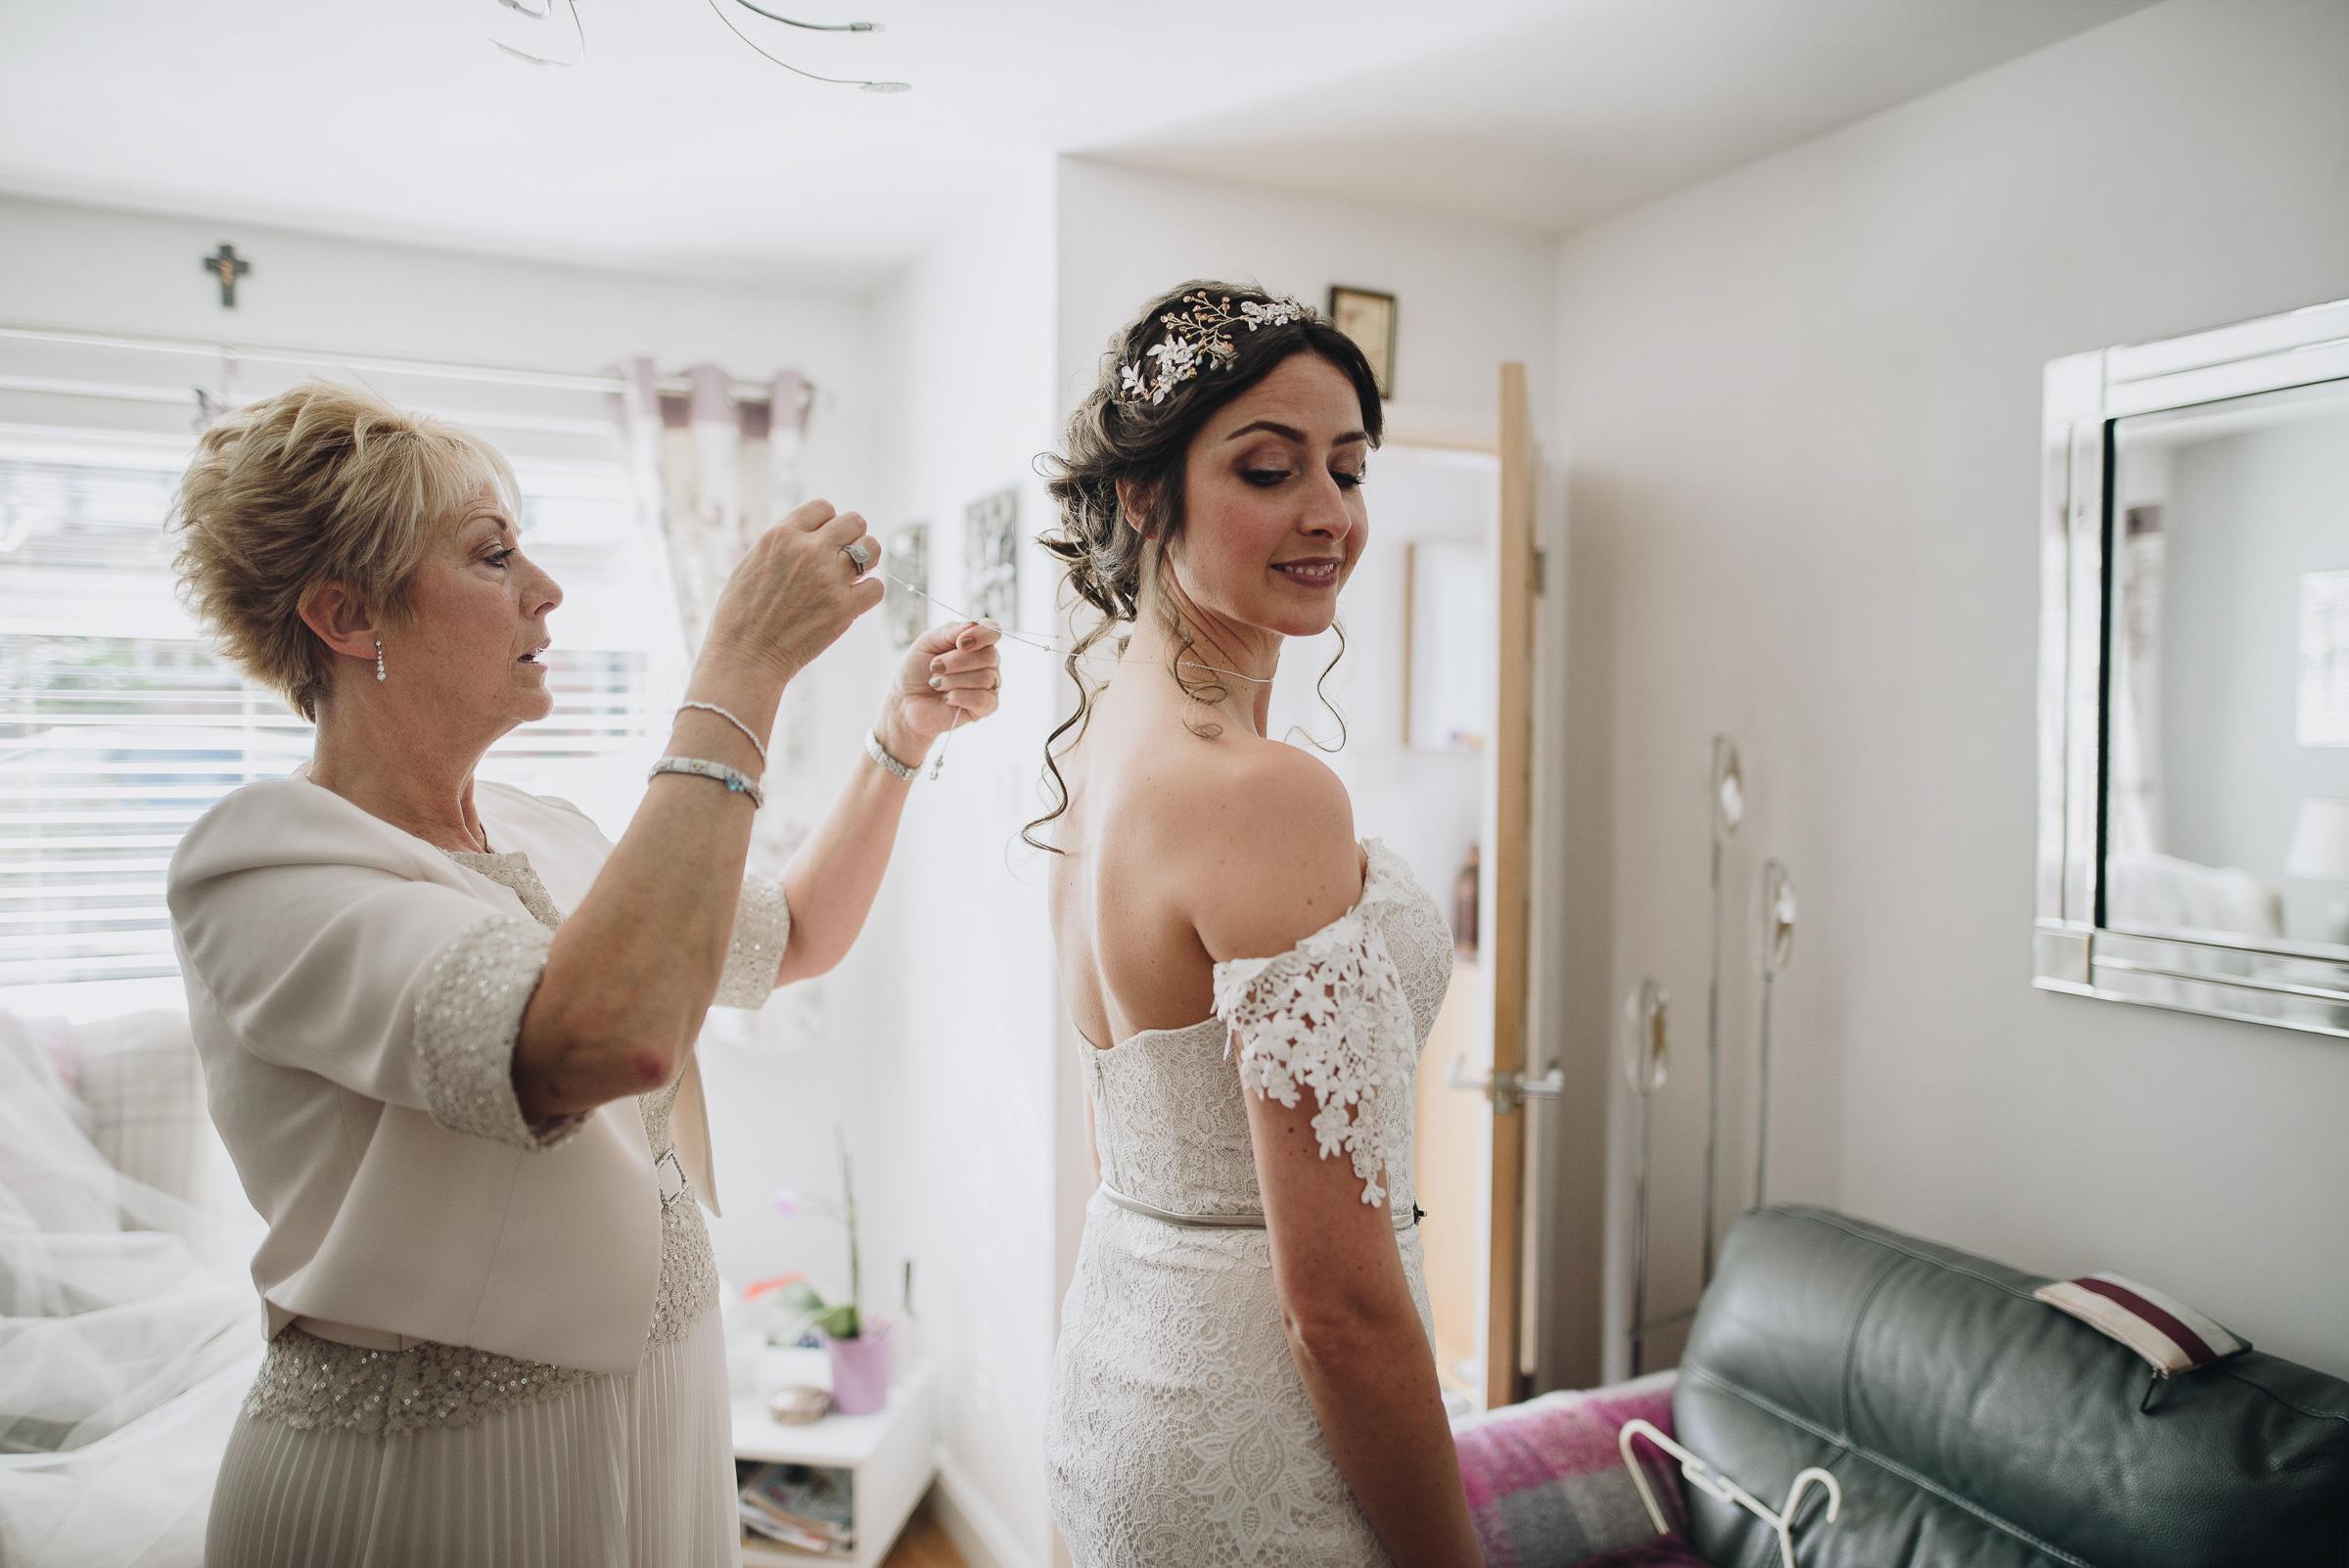 Rochdale-town-hall-vegan-harry-potter-wedding-photography-7.jpg